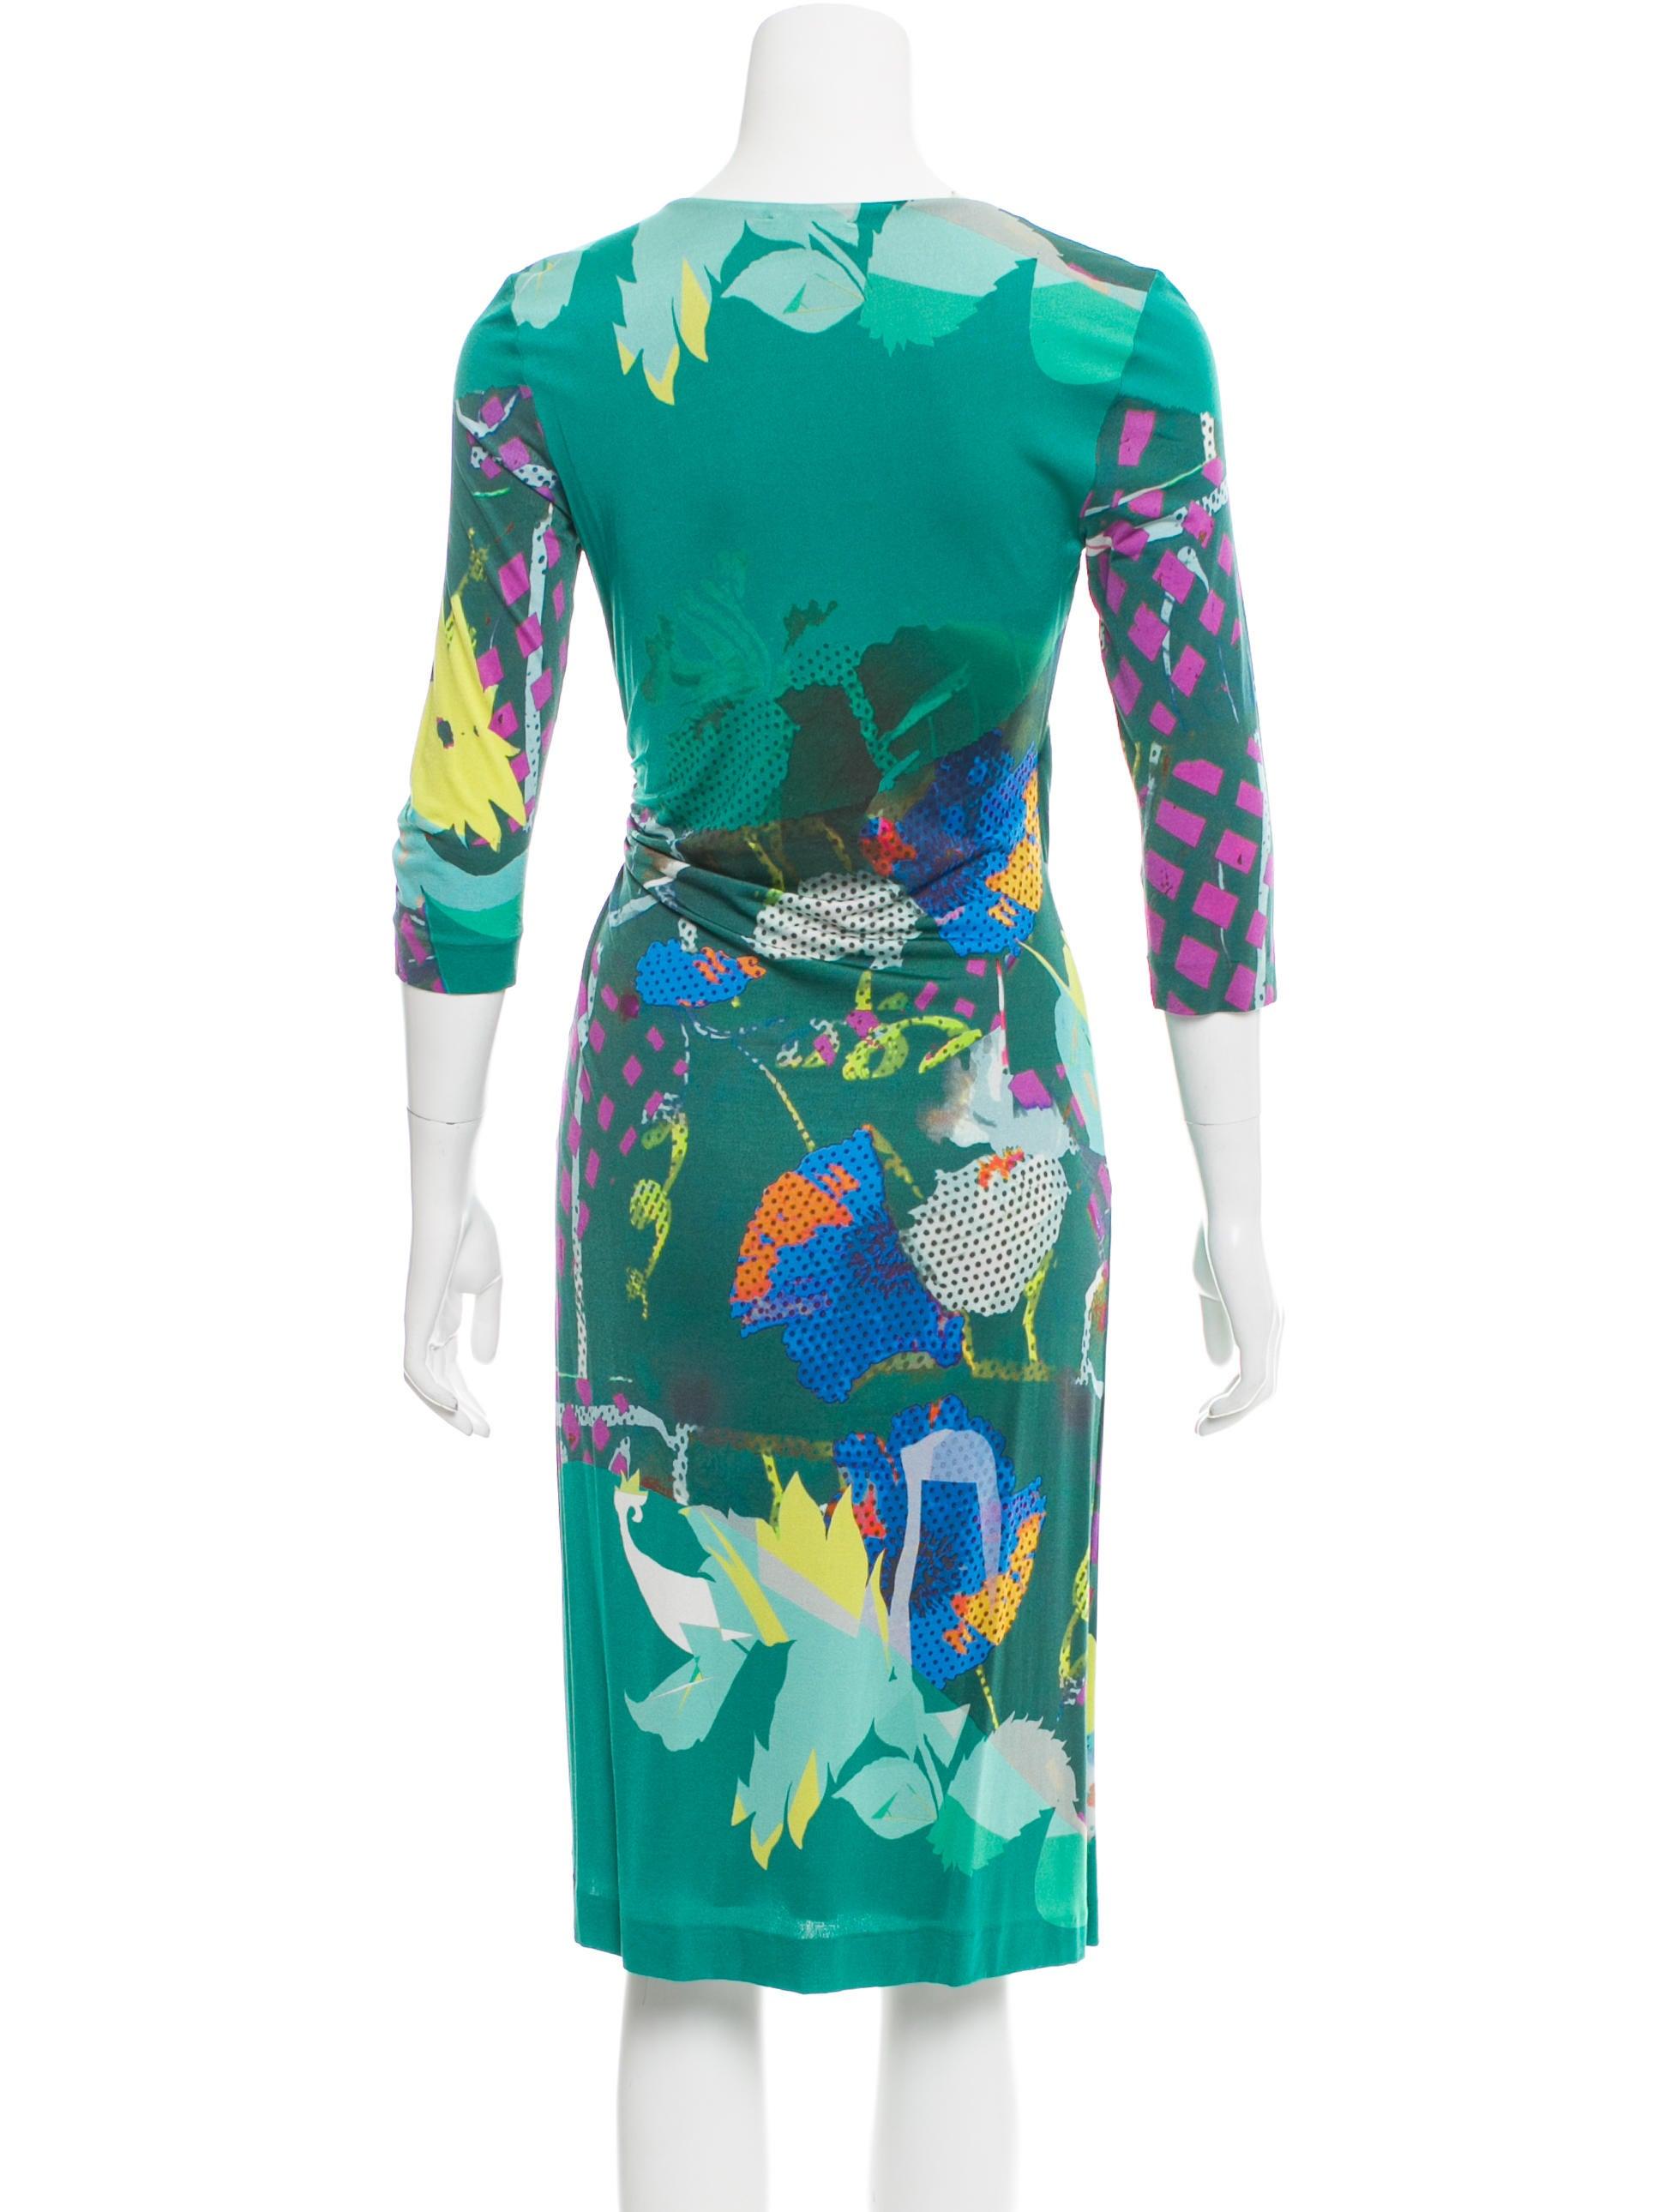 Etro Abstract Print Midi Dress Clothing Etr43702 The